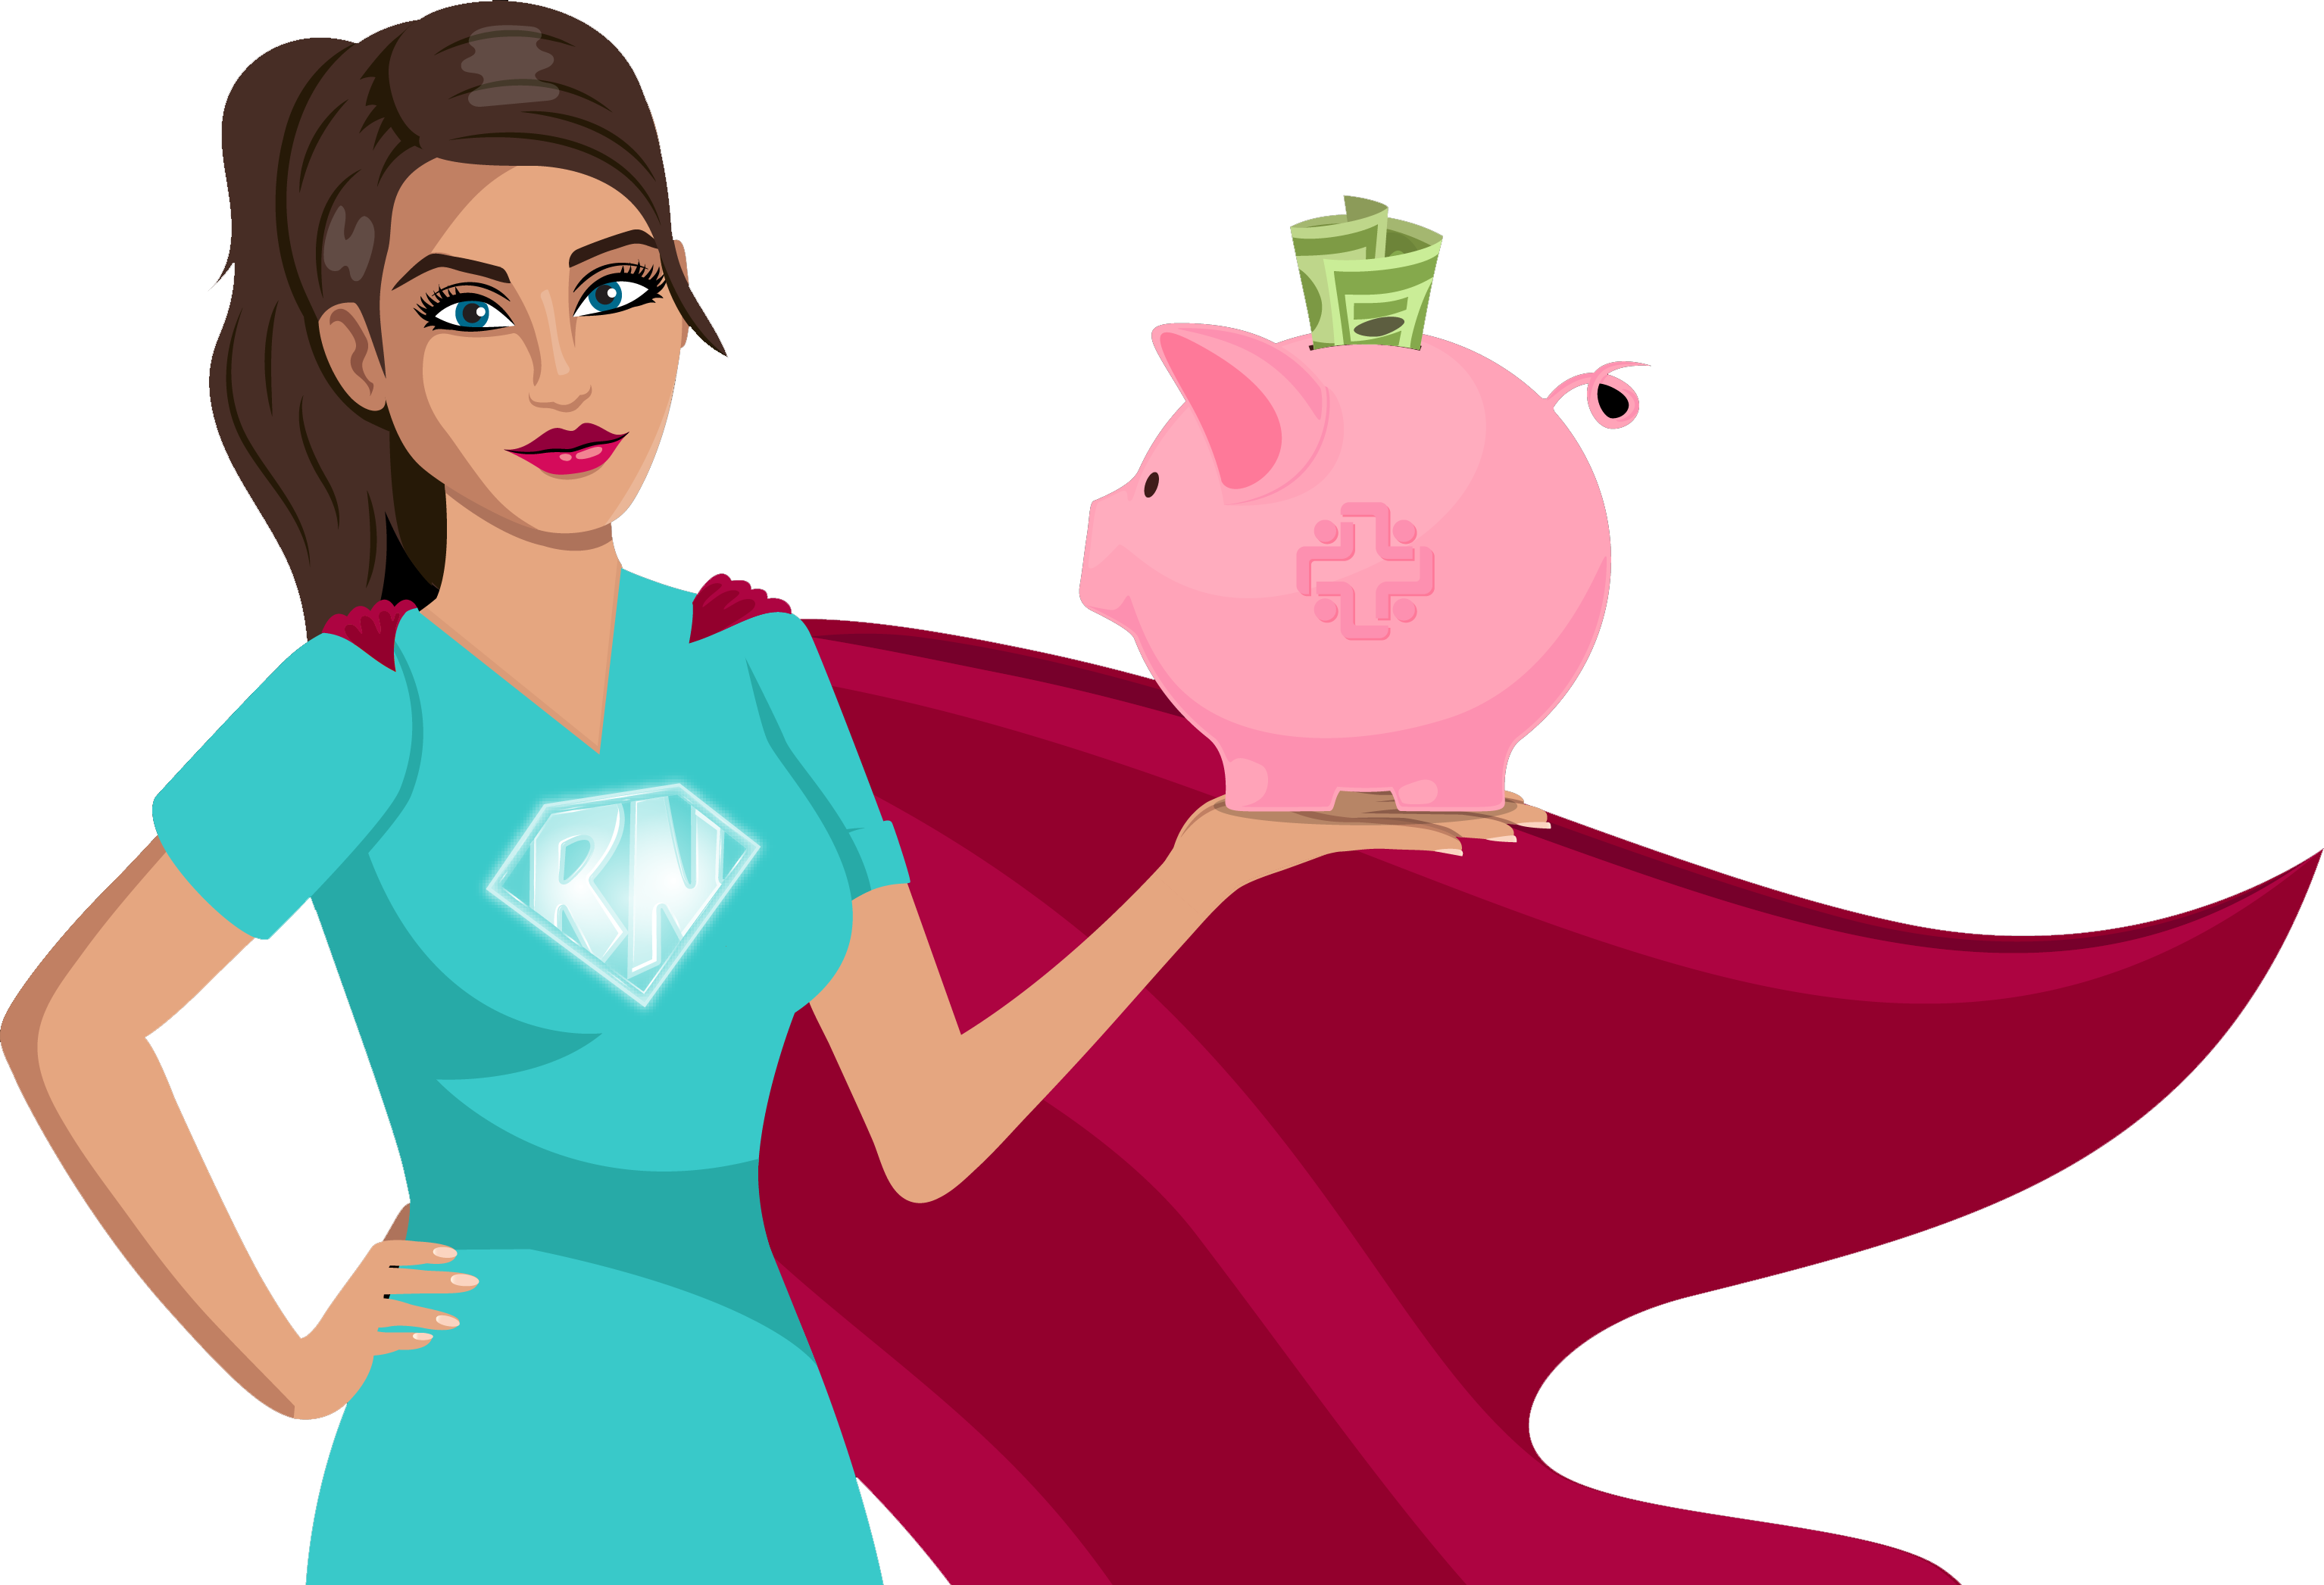 A super nurse holding a piggy bank